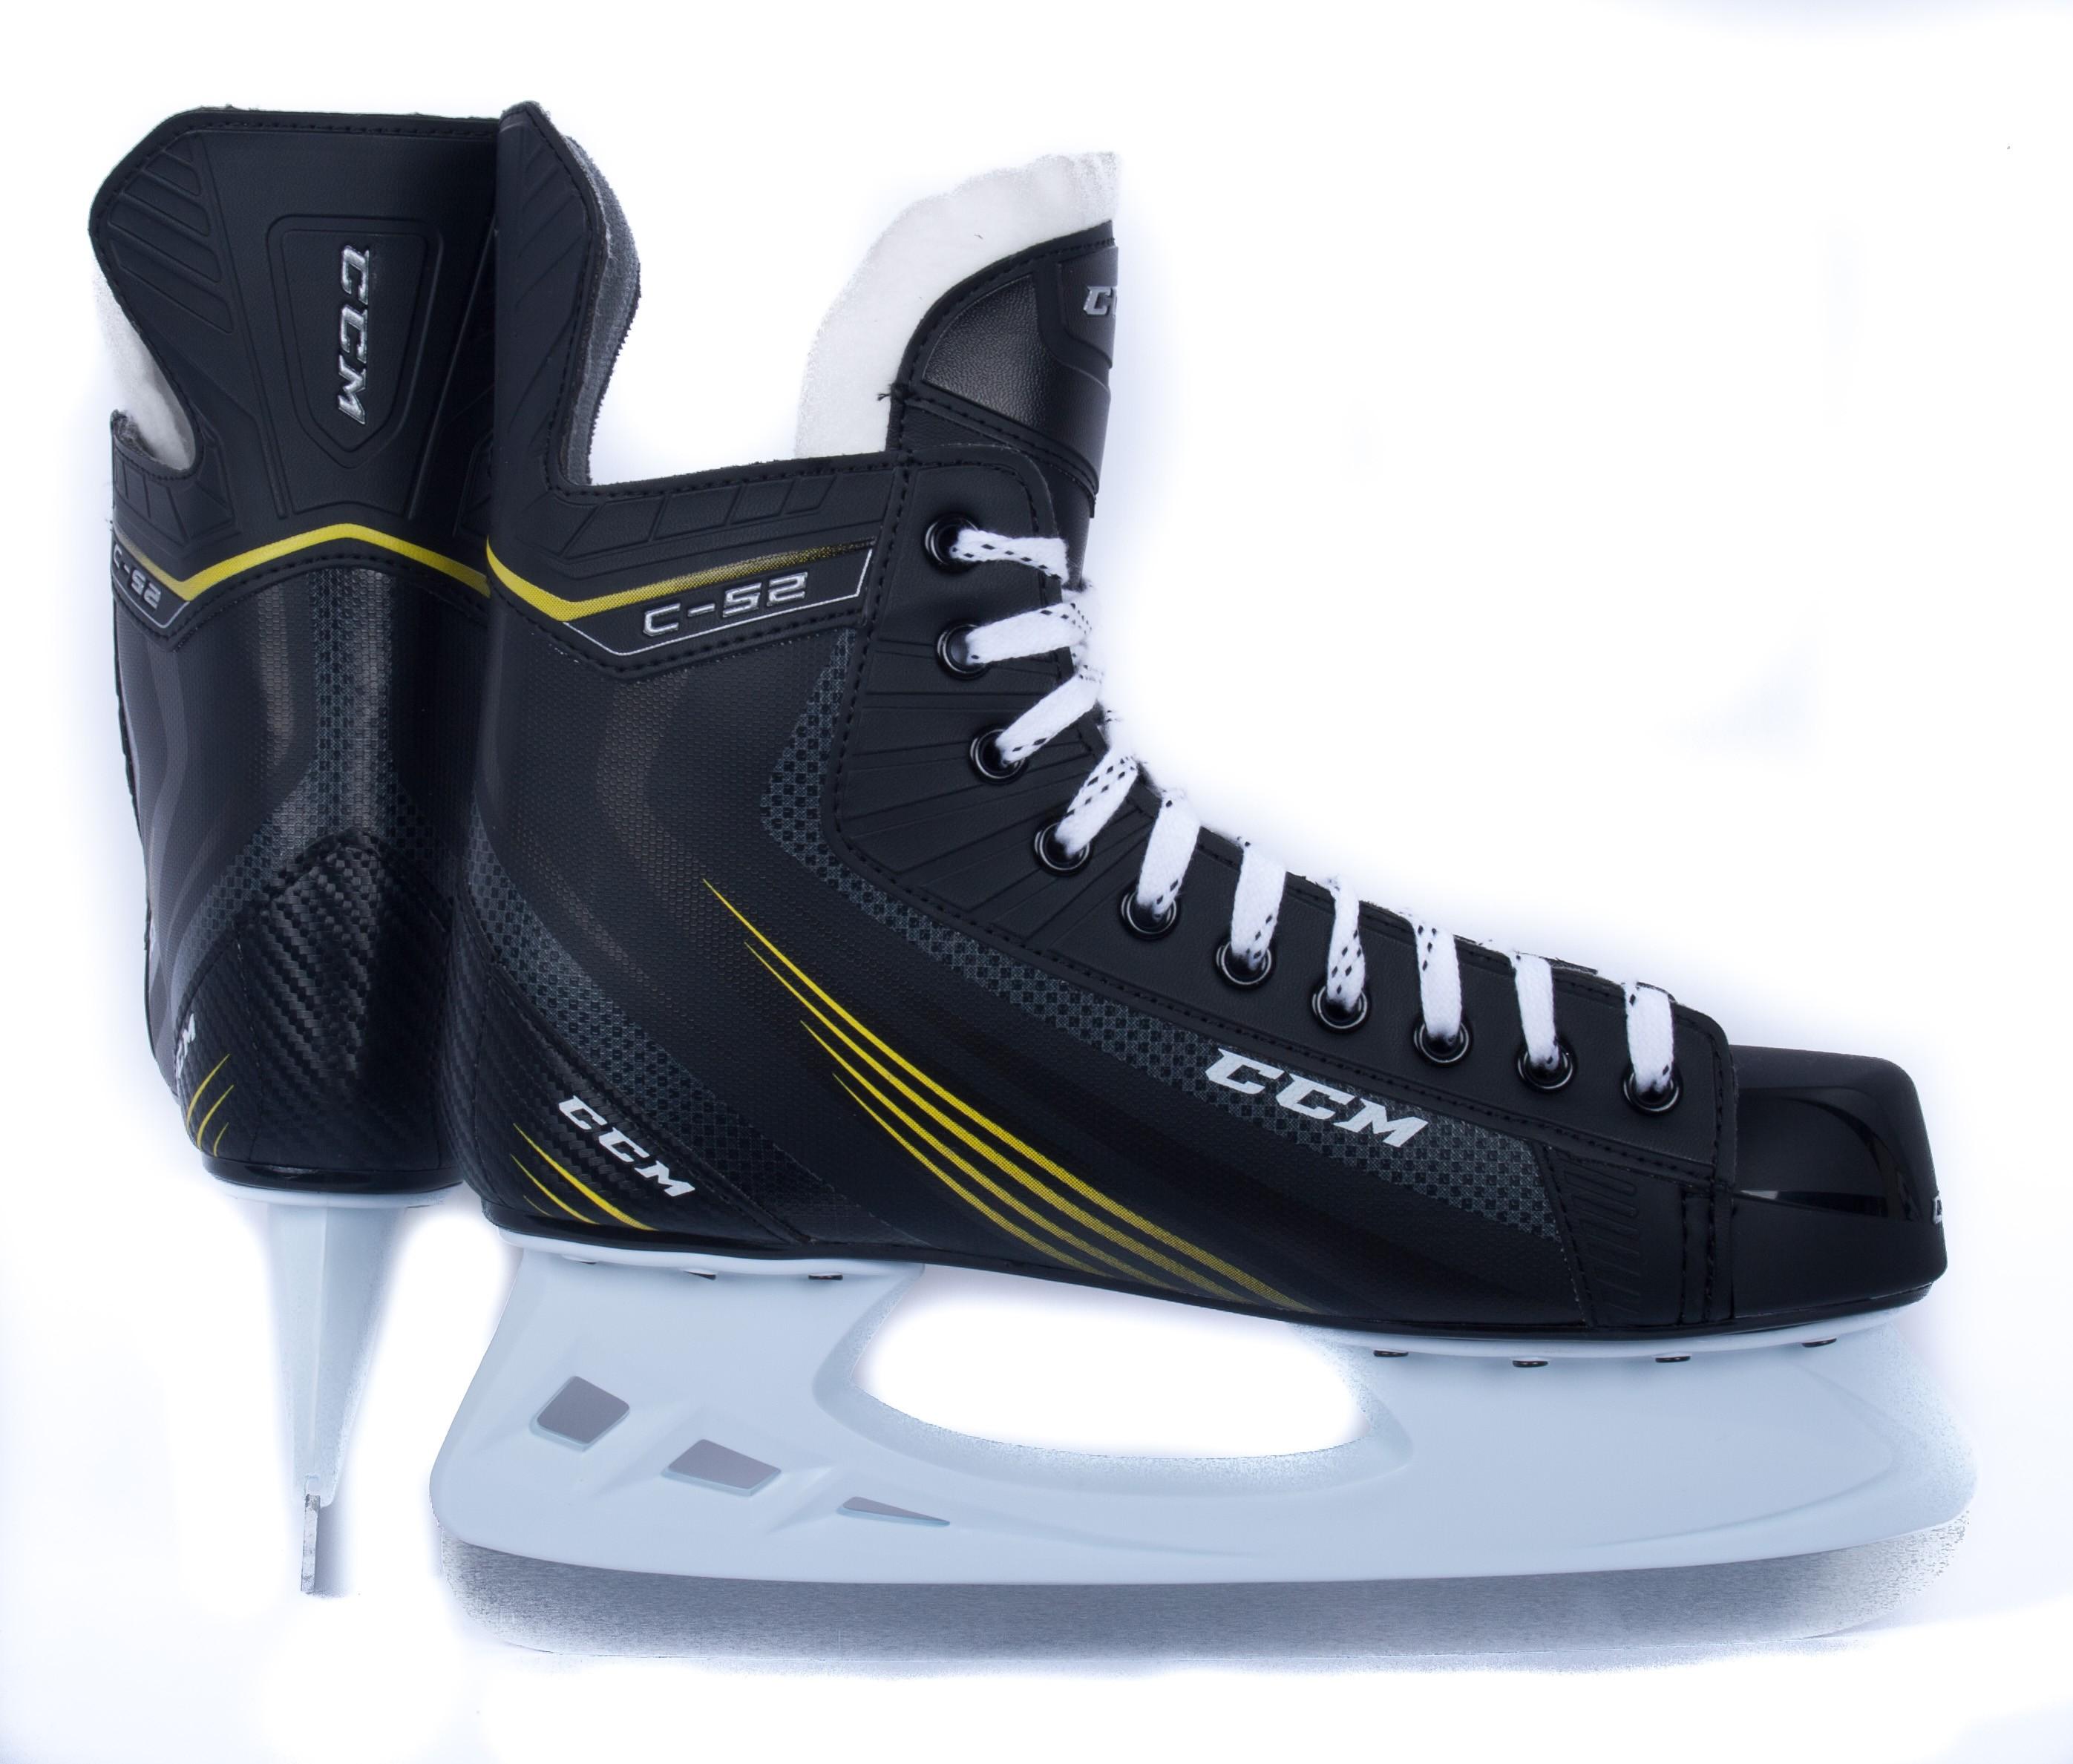 CCM Tacks C-52 Youth Ice Hockey Skates